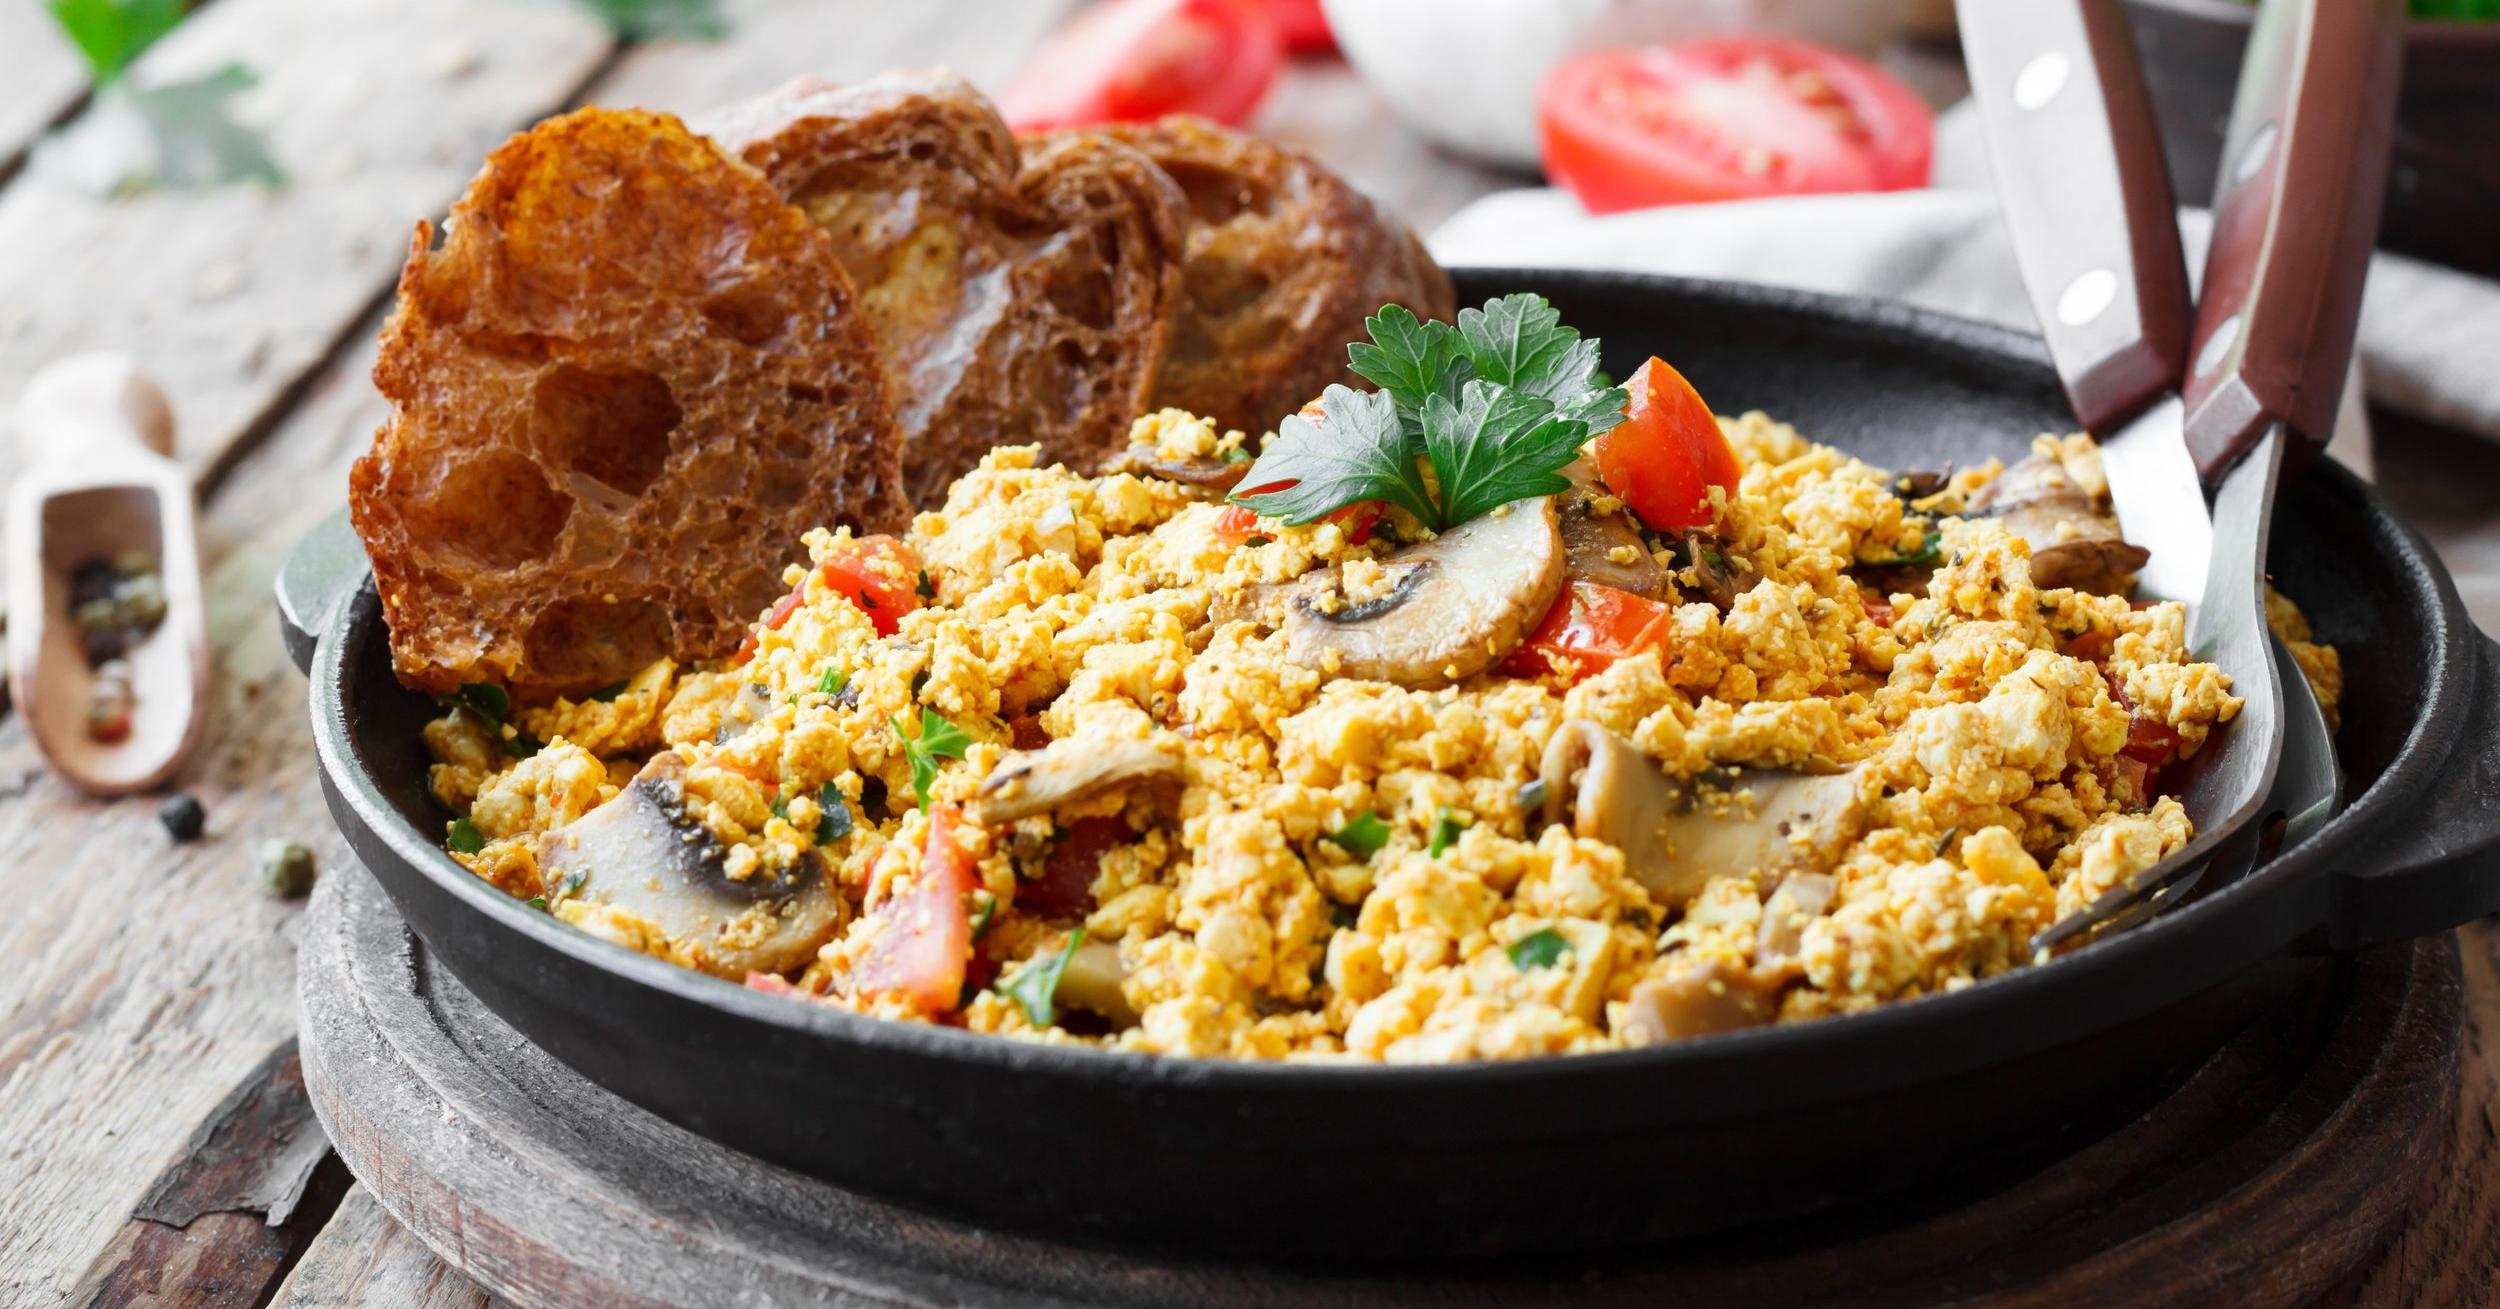 Plant-based breakfast tofu scramble, vegetables and vegan brunch ideas.